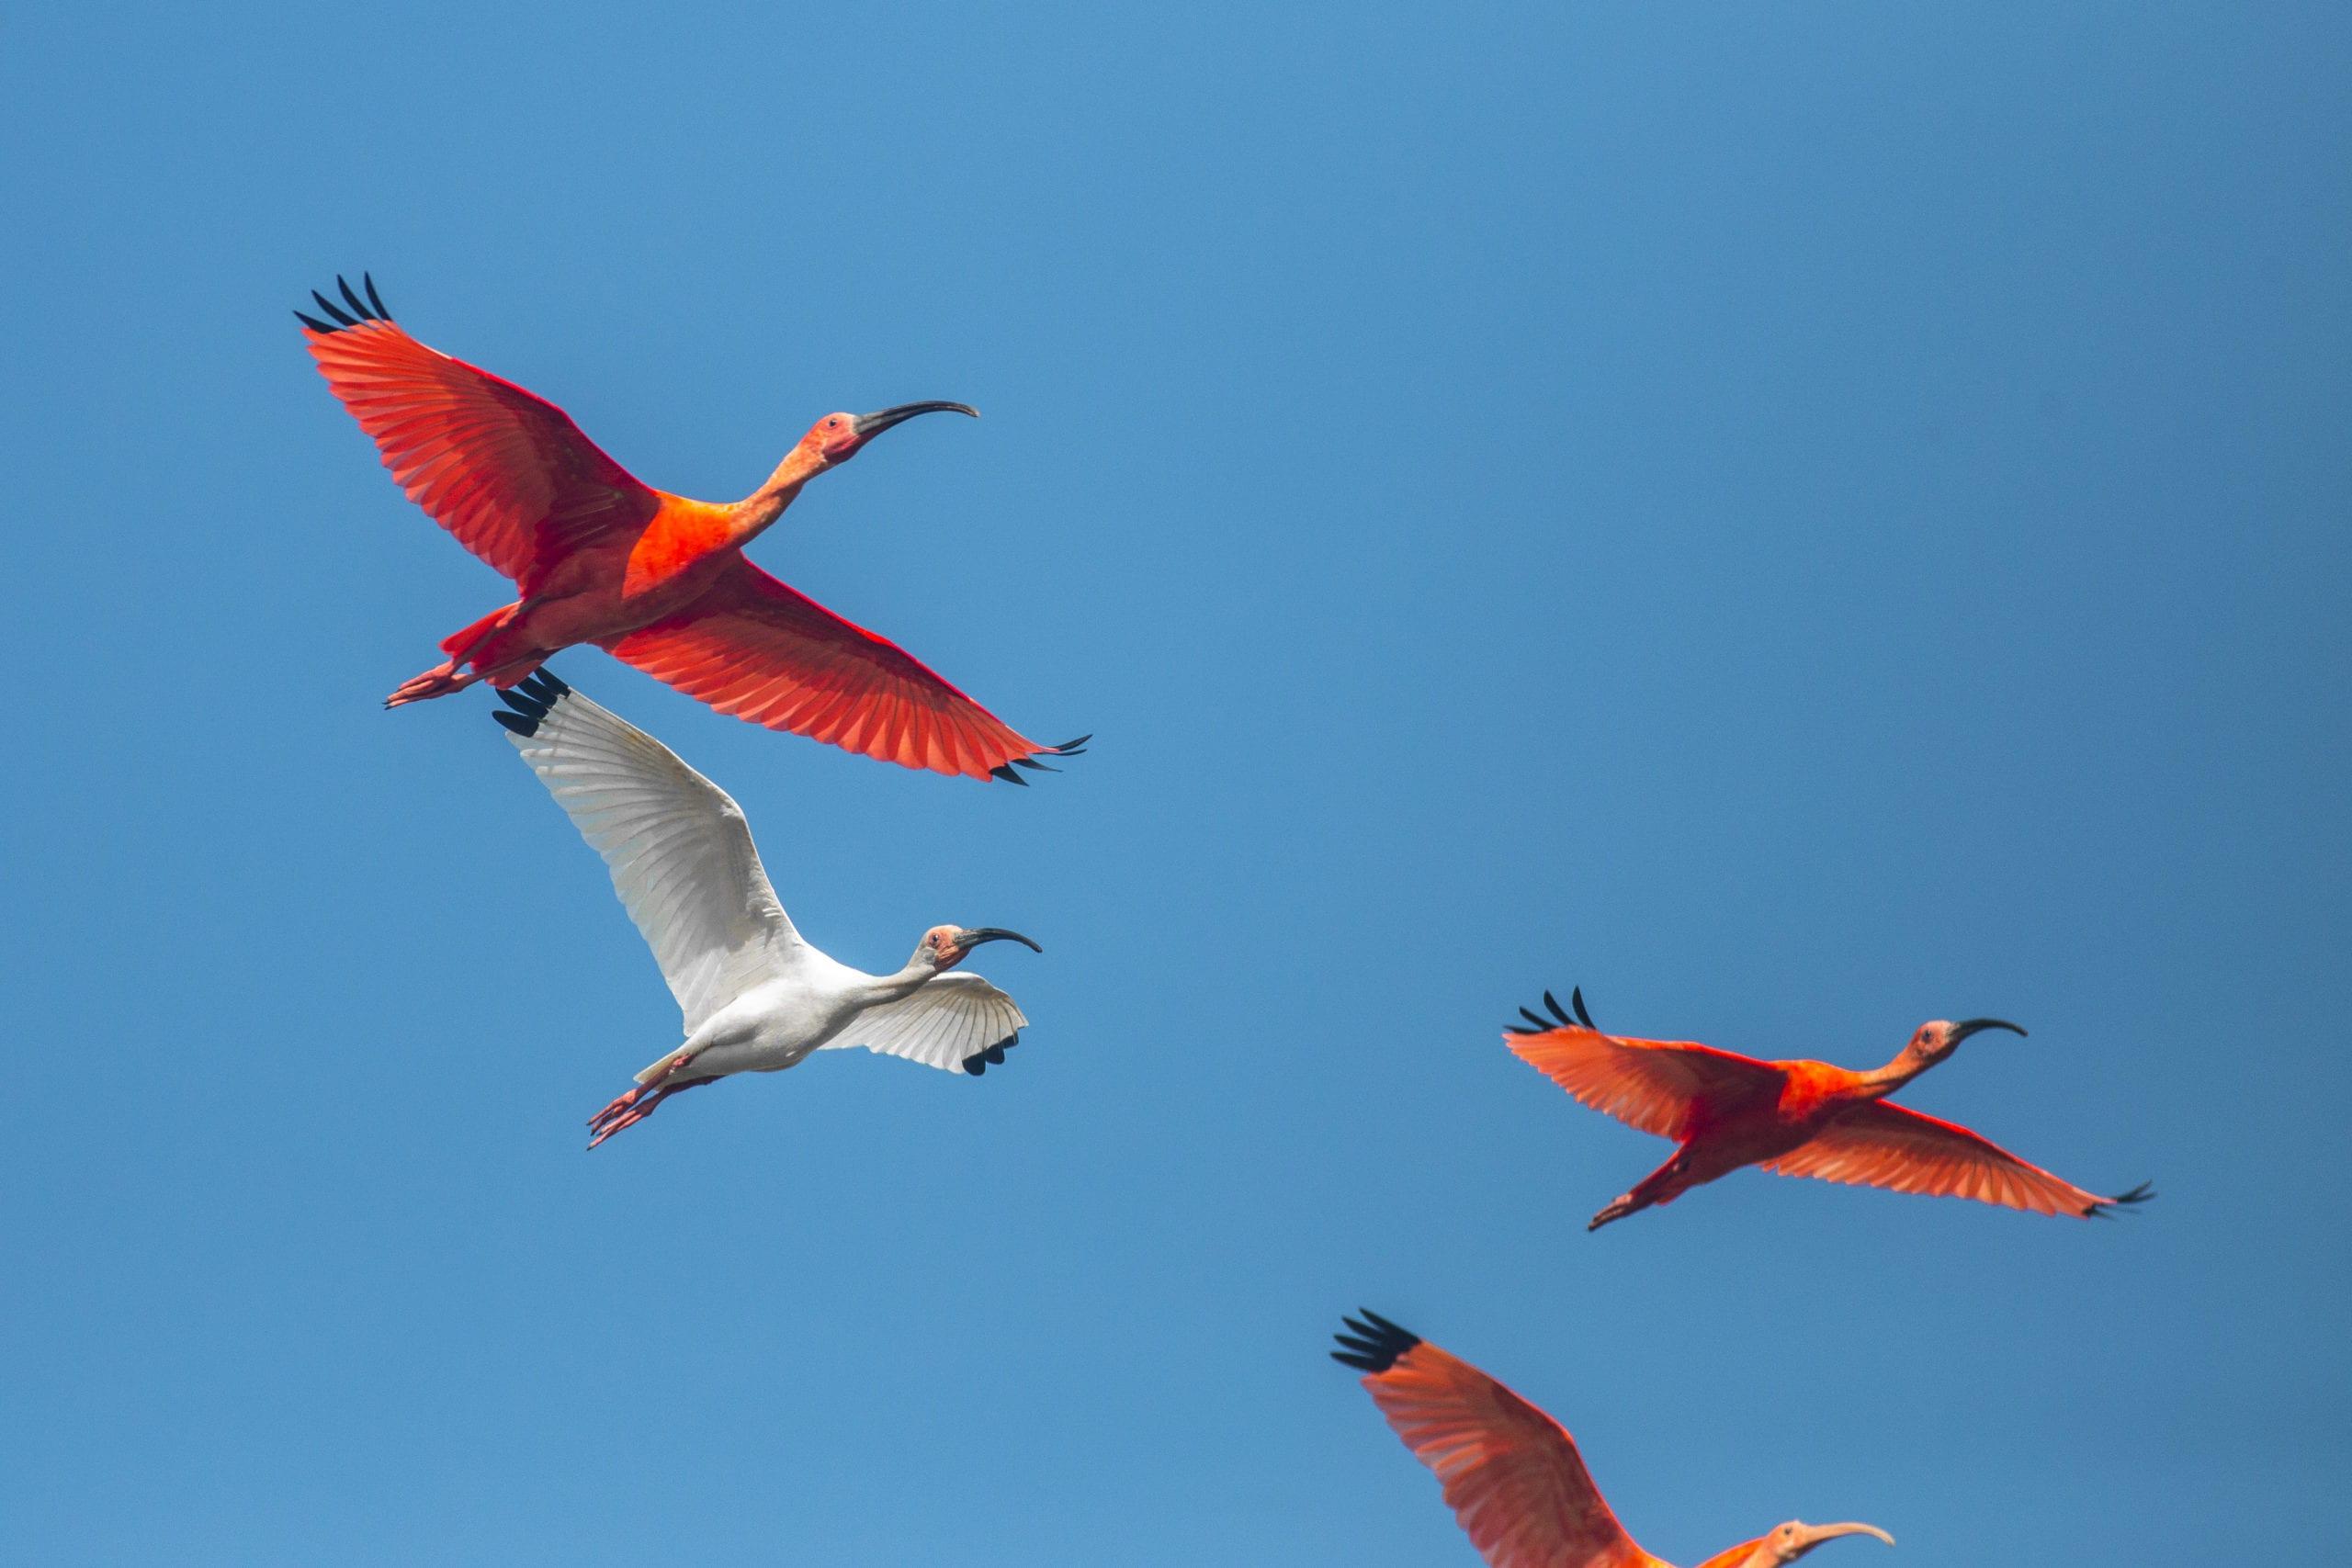 Corocora Wildlife Camp birds flying